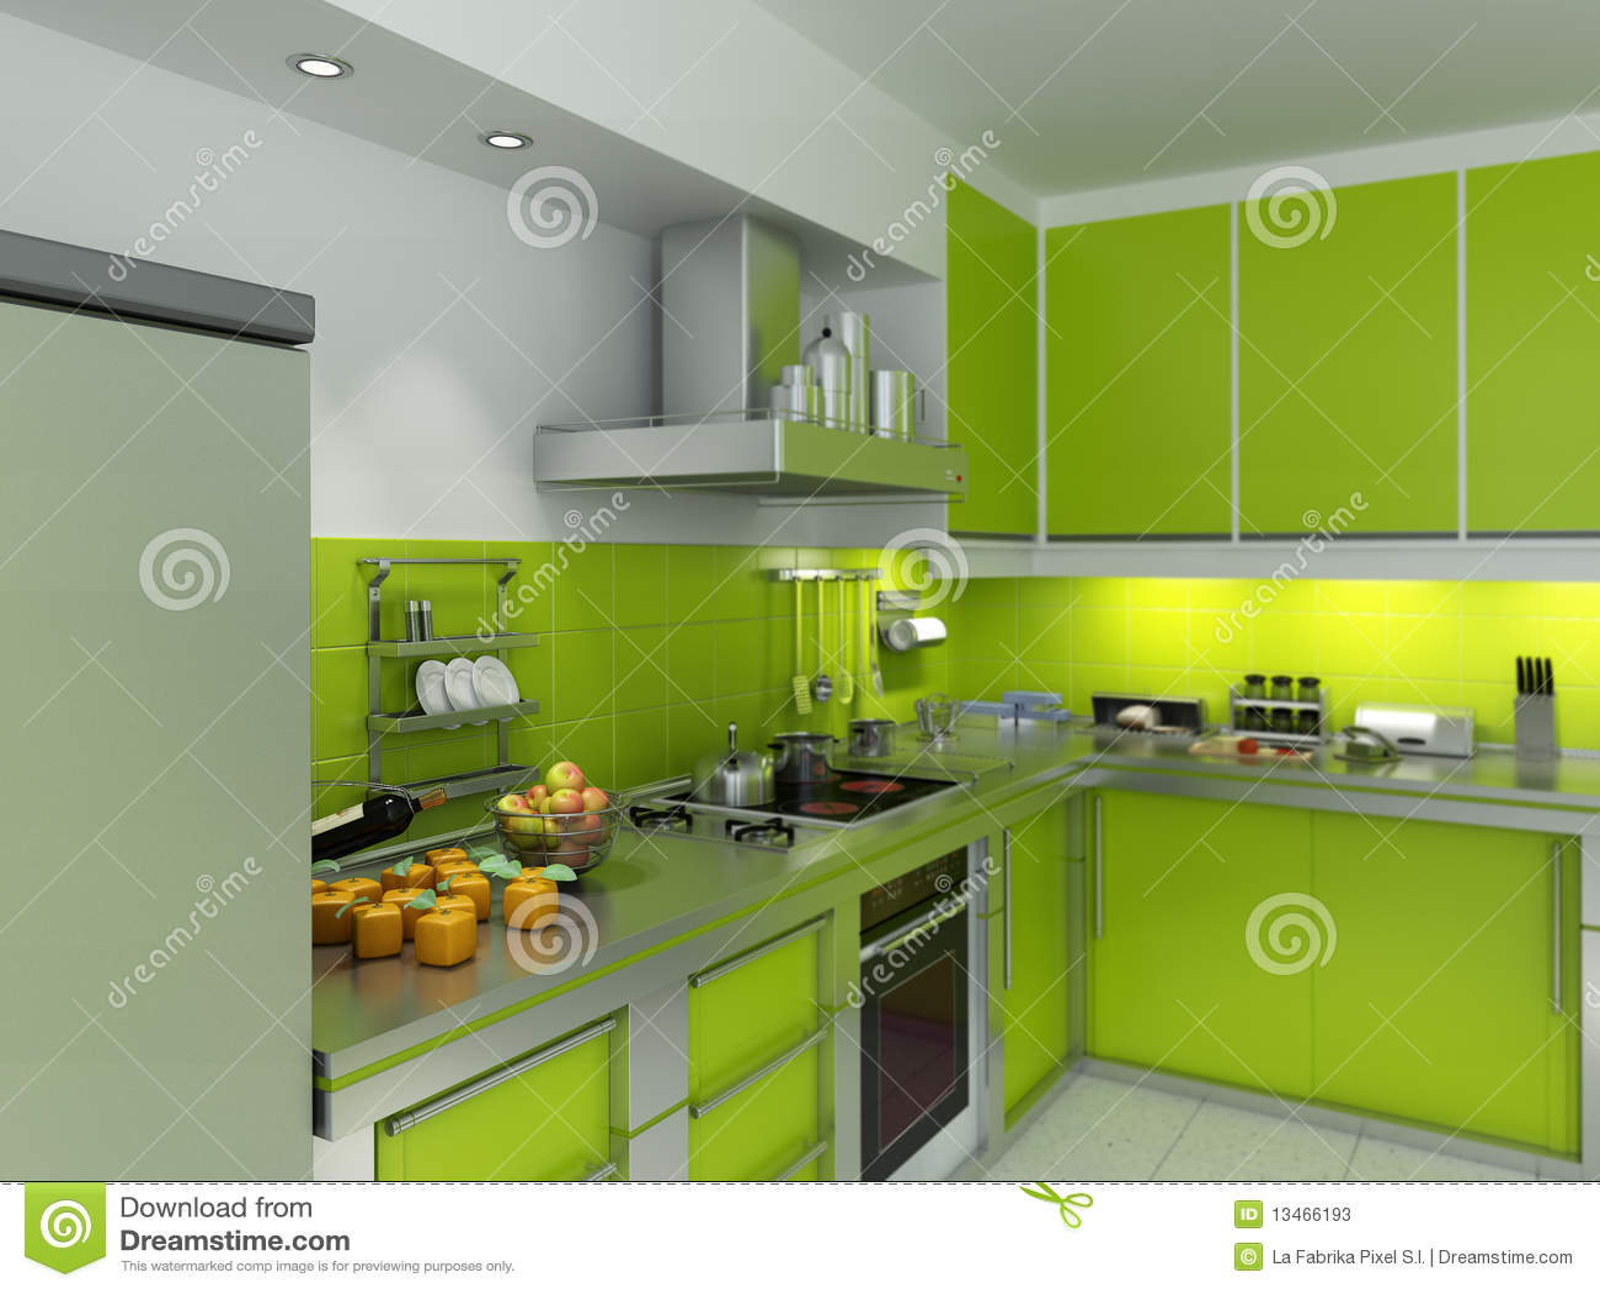 Cuisine tunisienne meuble vert: .jpeg. index cuisine design verte. .